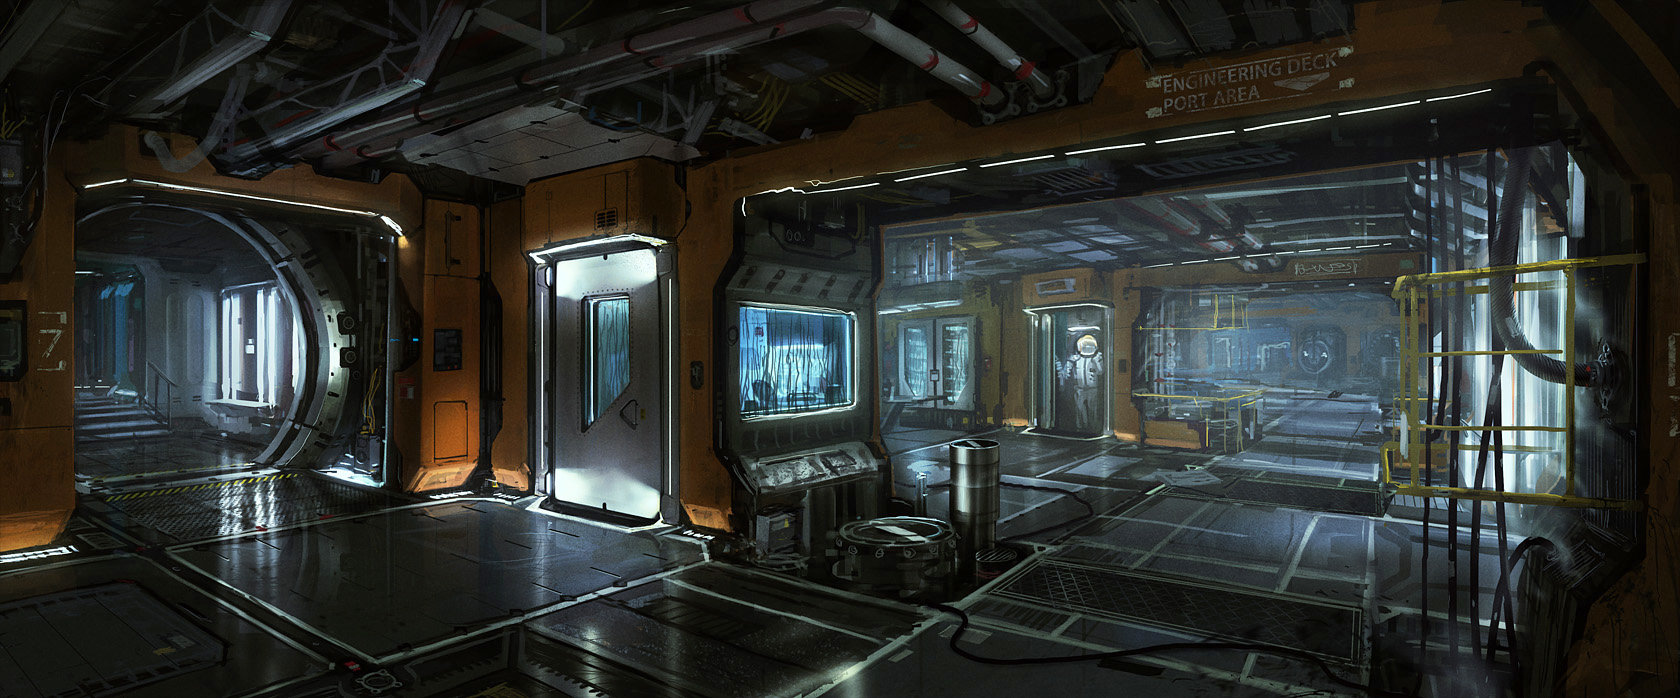 Viktor jonsson spaceship interior corridor 05ggbig